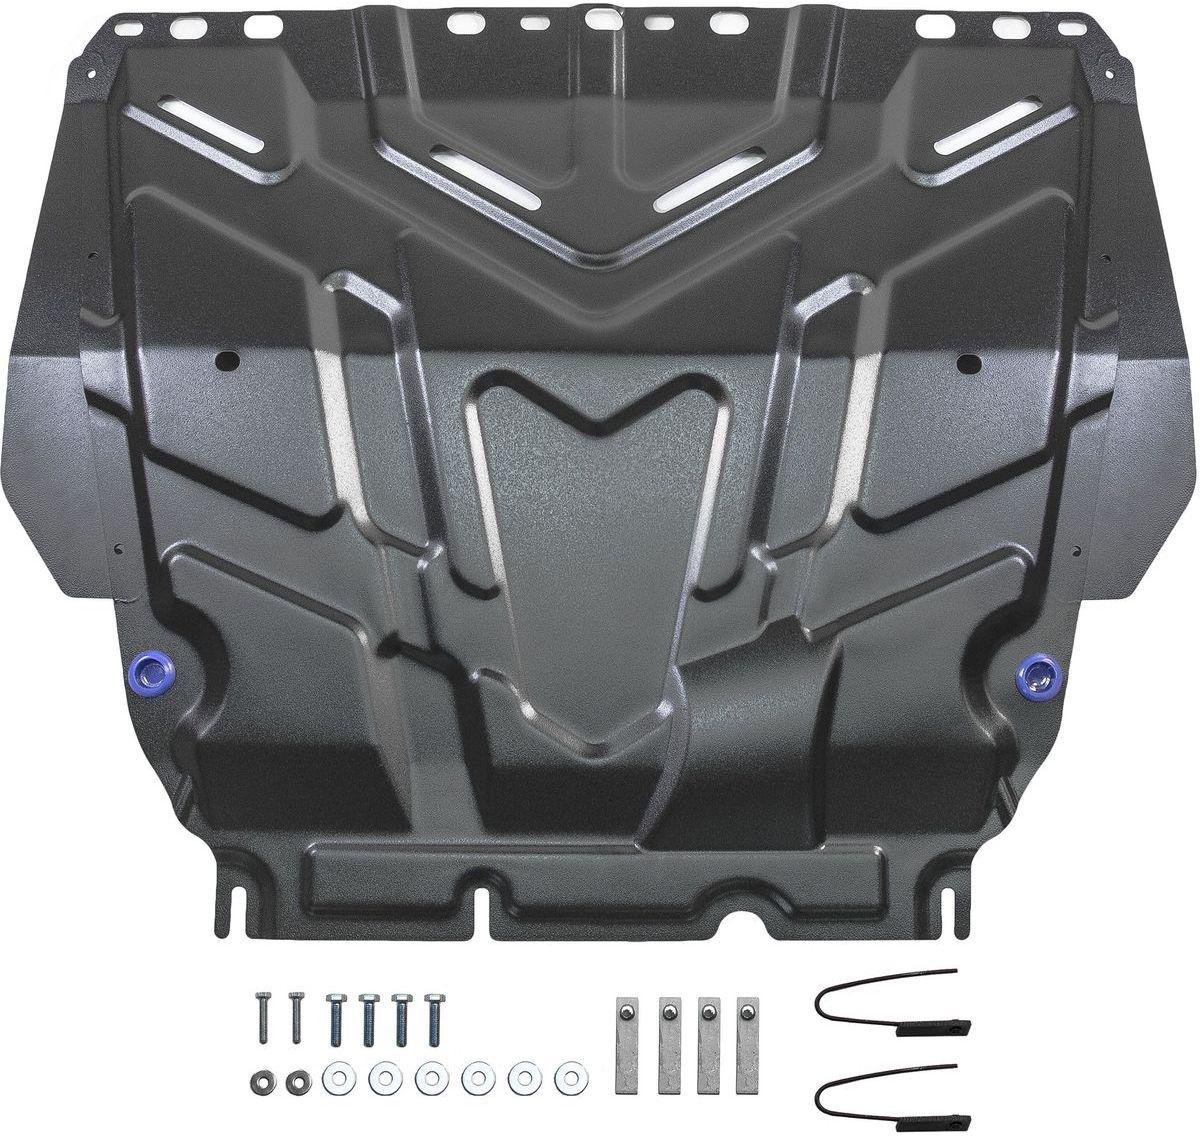 Купить Защита картера и КПП Rival для Ford С-Max 2003-2010/Ford Focus 2005-2011 2011-2015 2015-н.в./Ford Grand C-Max 2010-2015/Ford Kuga 2008-2013, сталь 2 мм